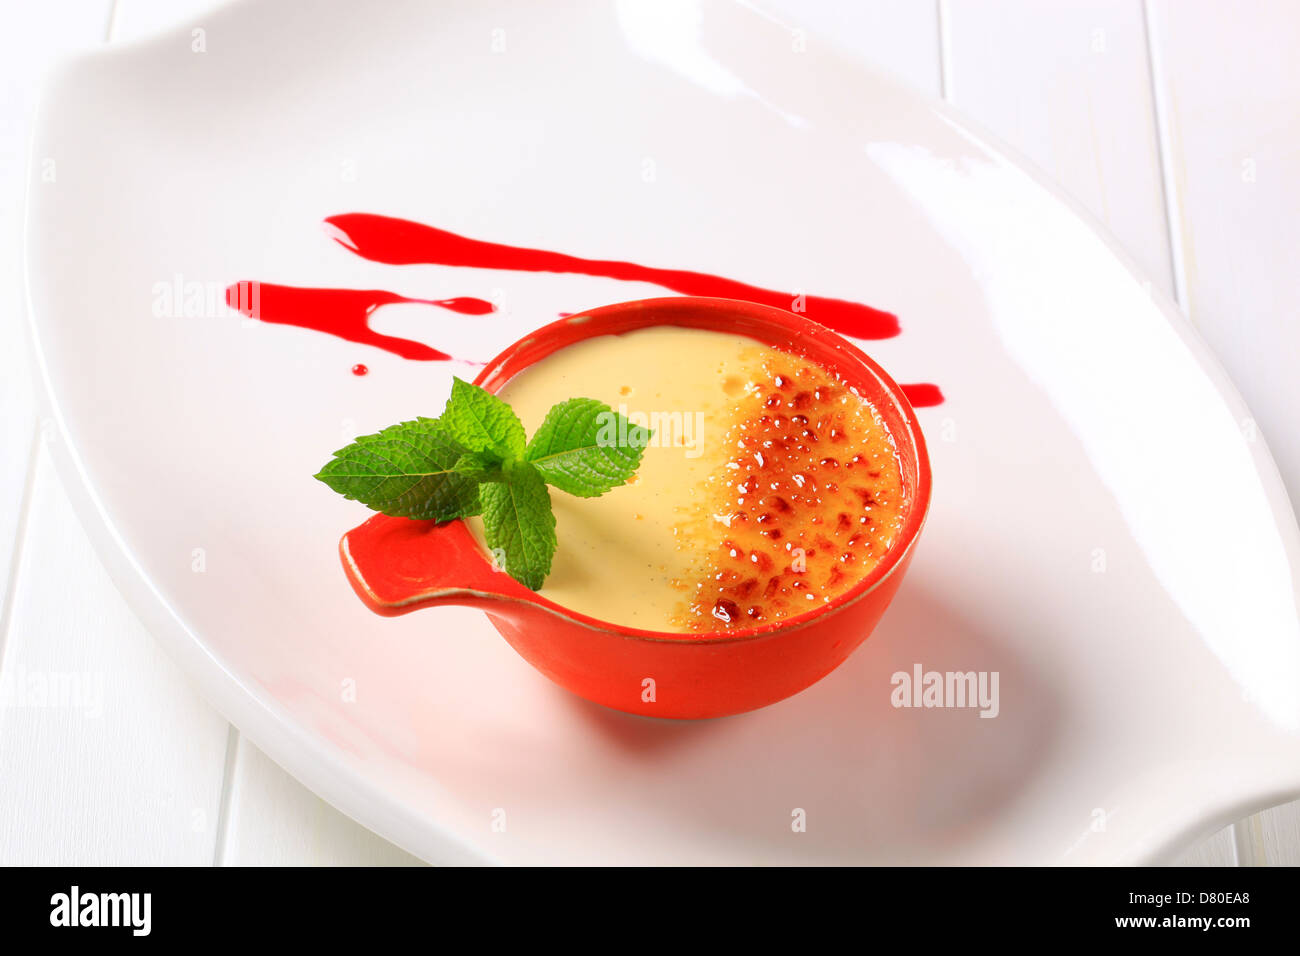 Creme brulee - Stock Image